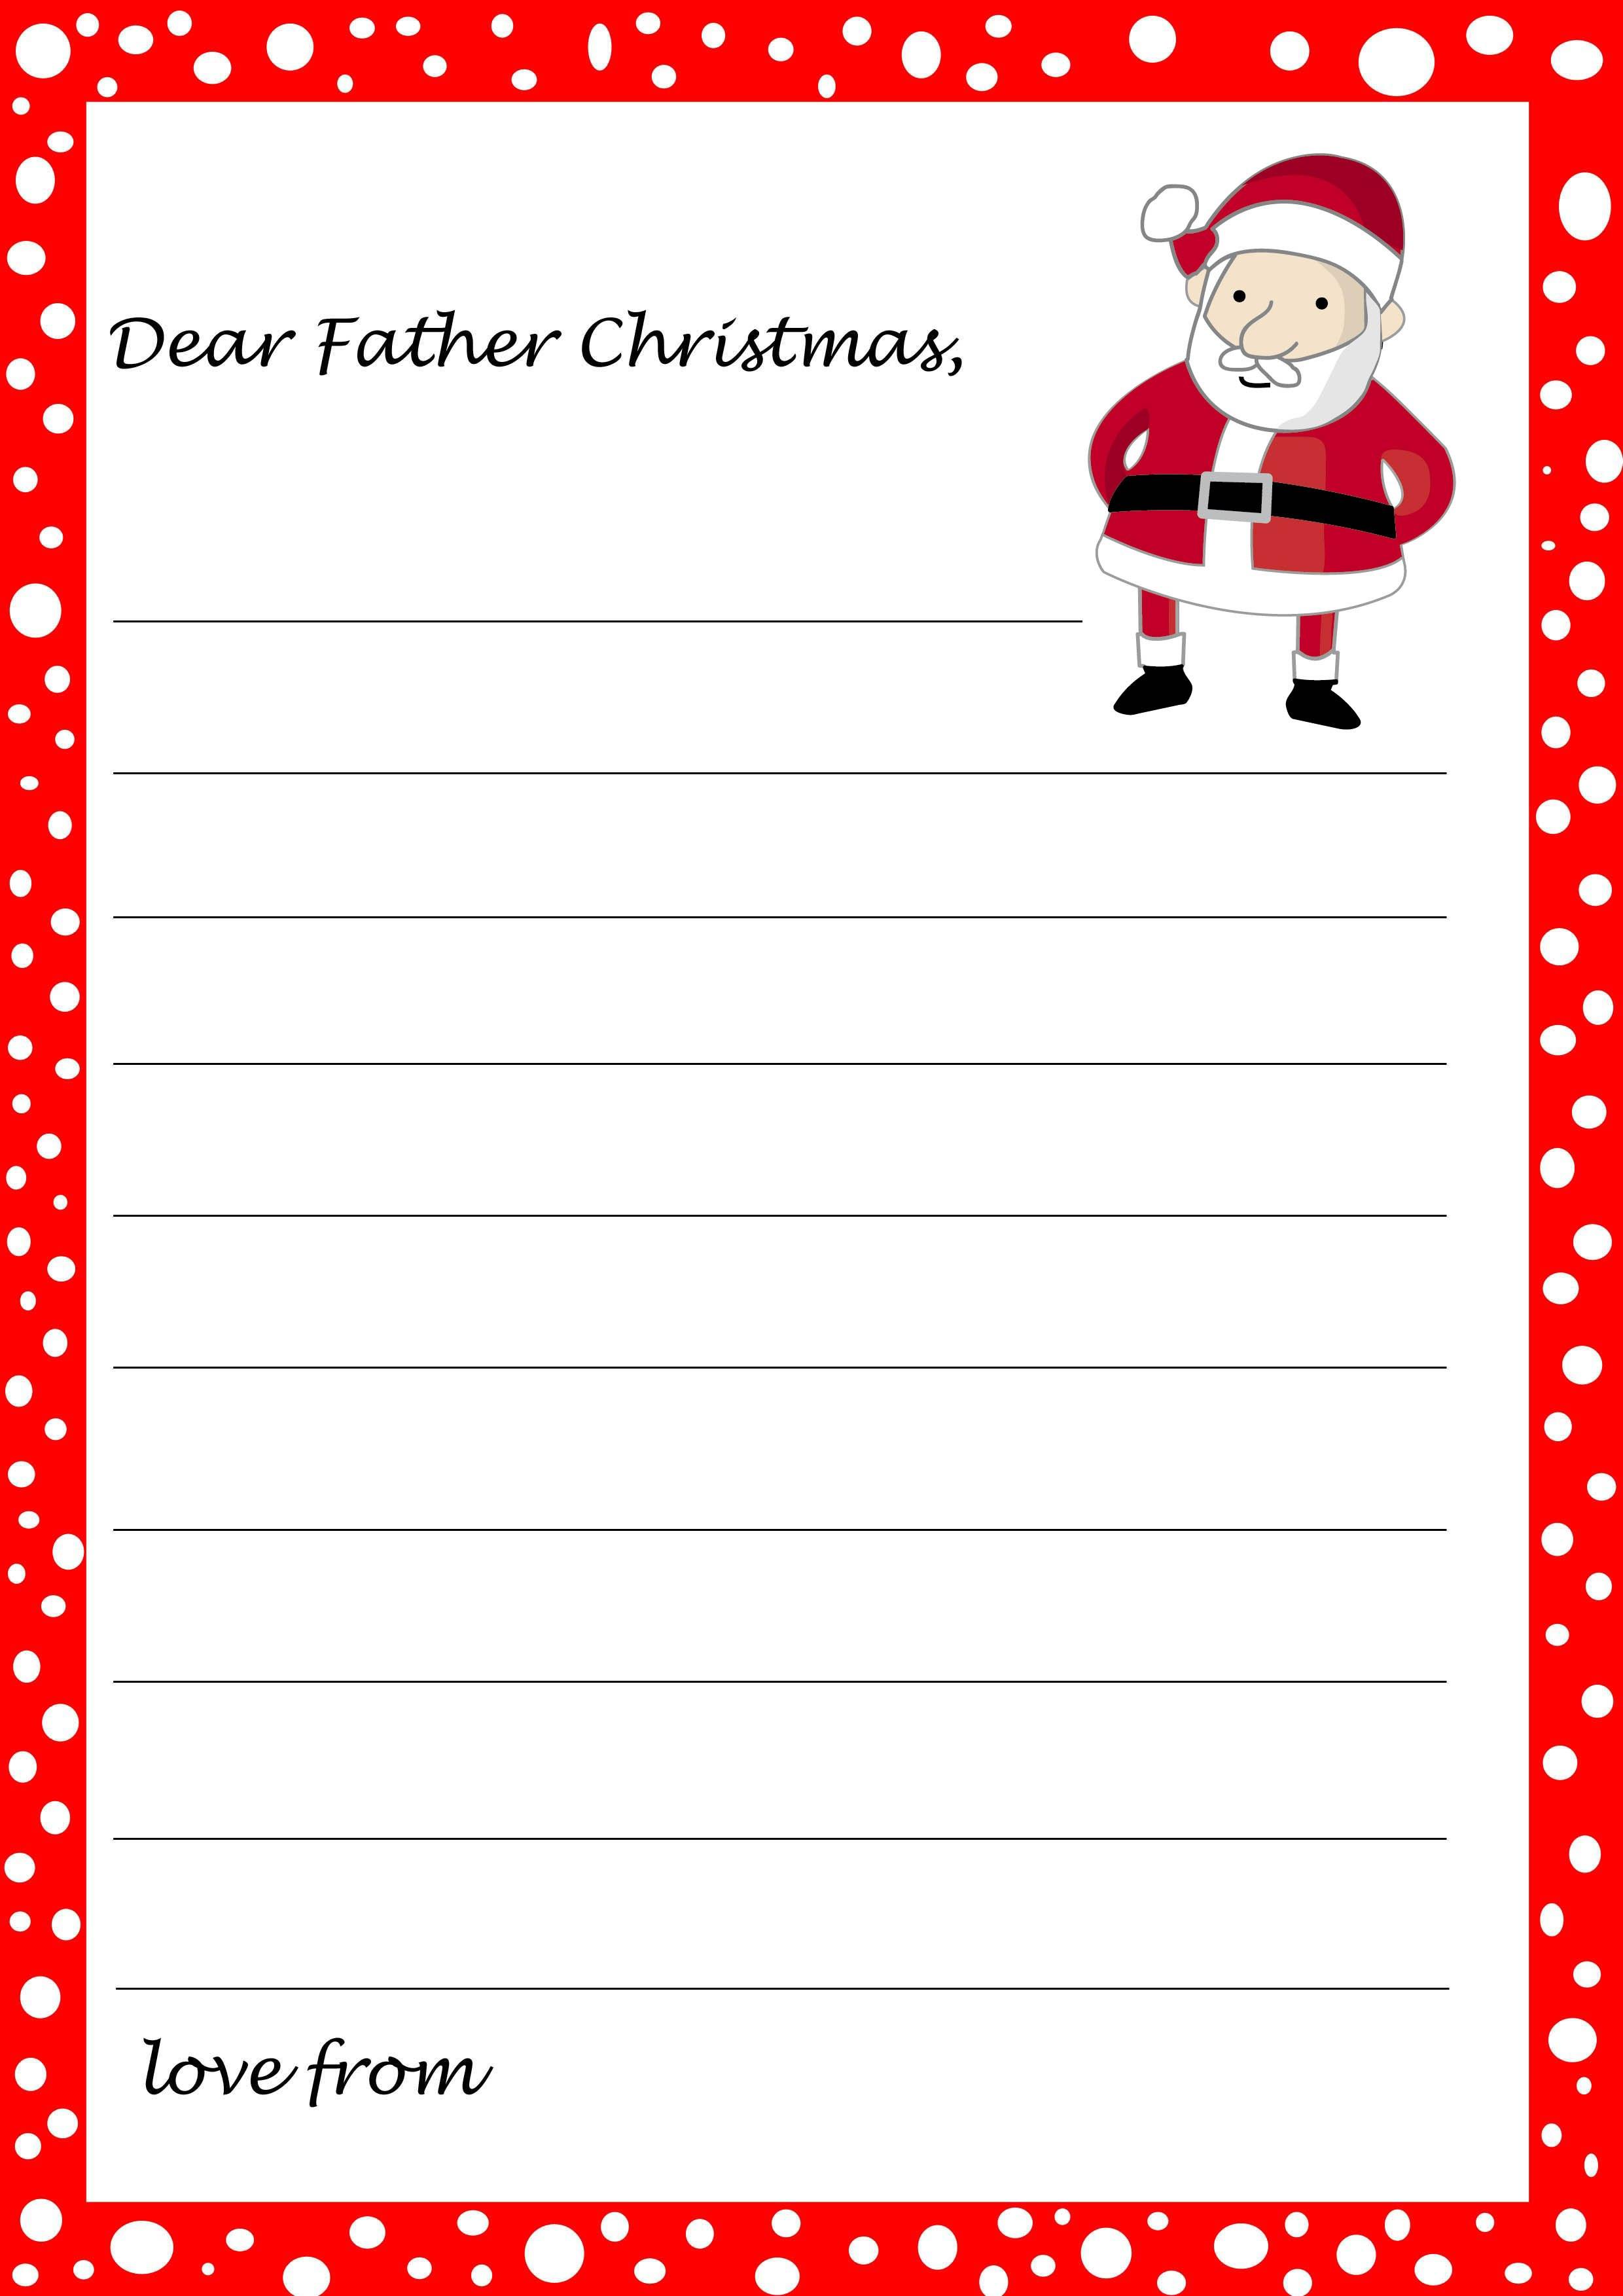 Christmas Letter From Santa Template Sample Within Blank Letter From Santa Template